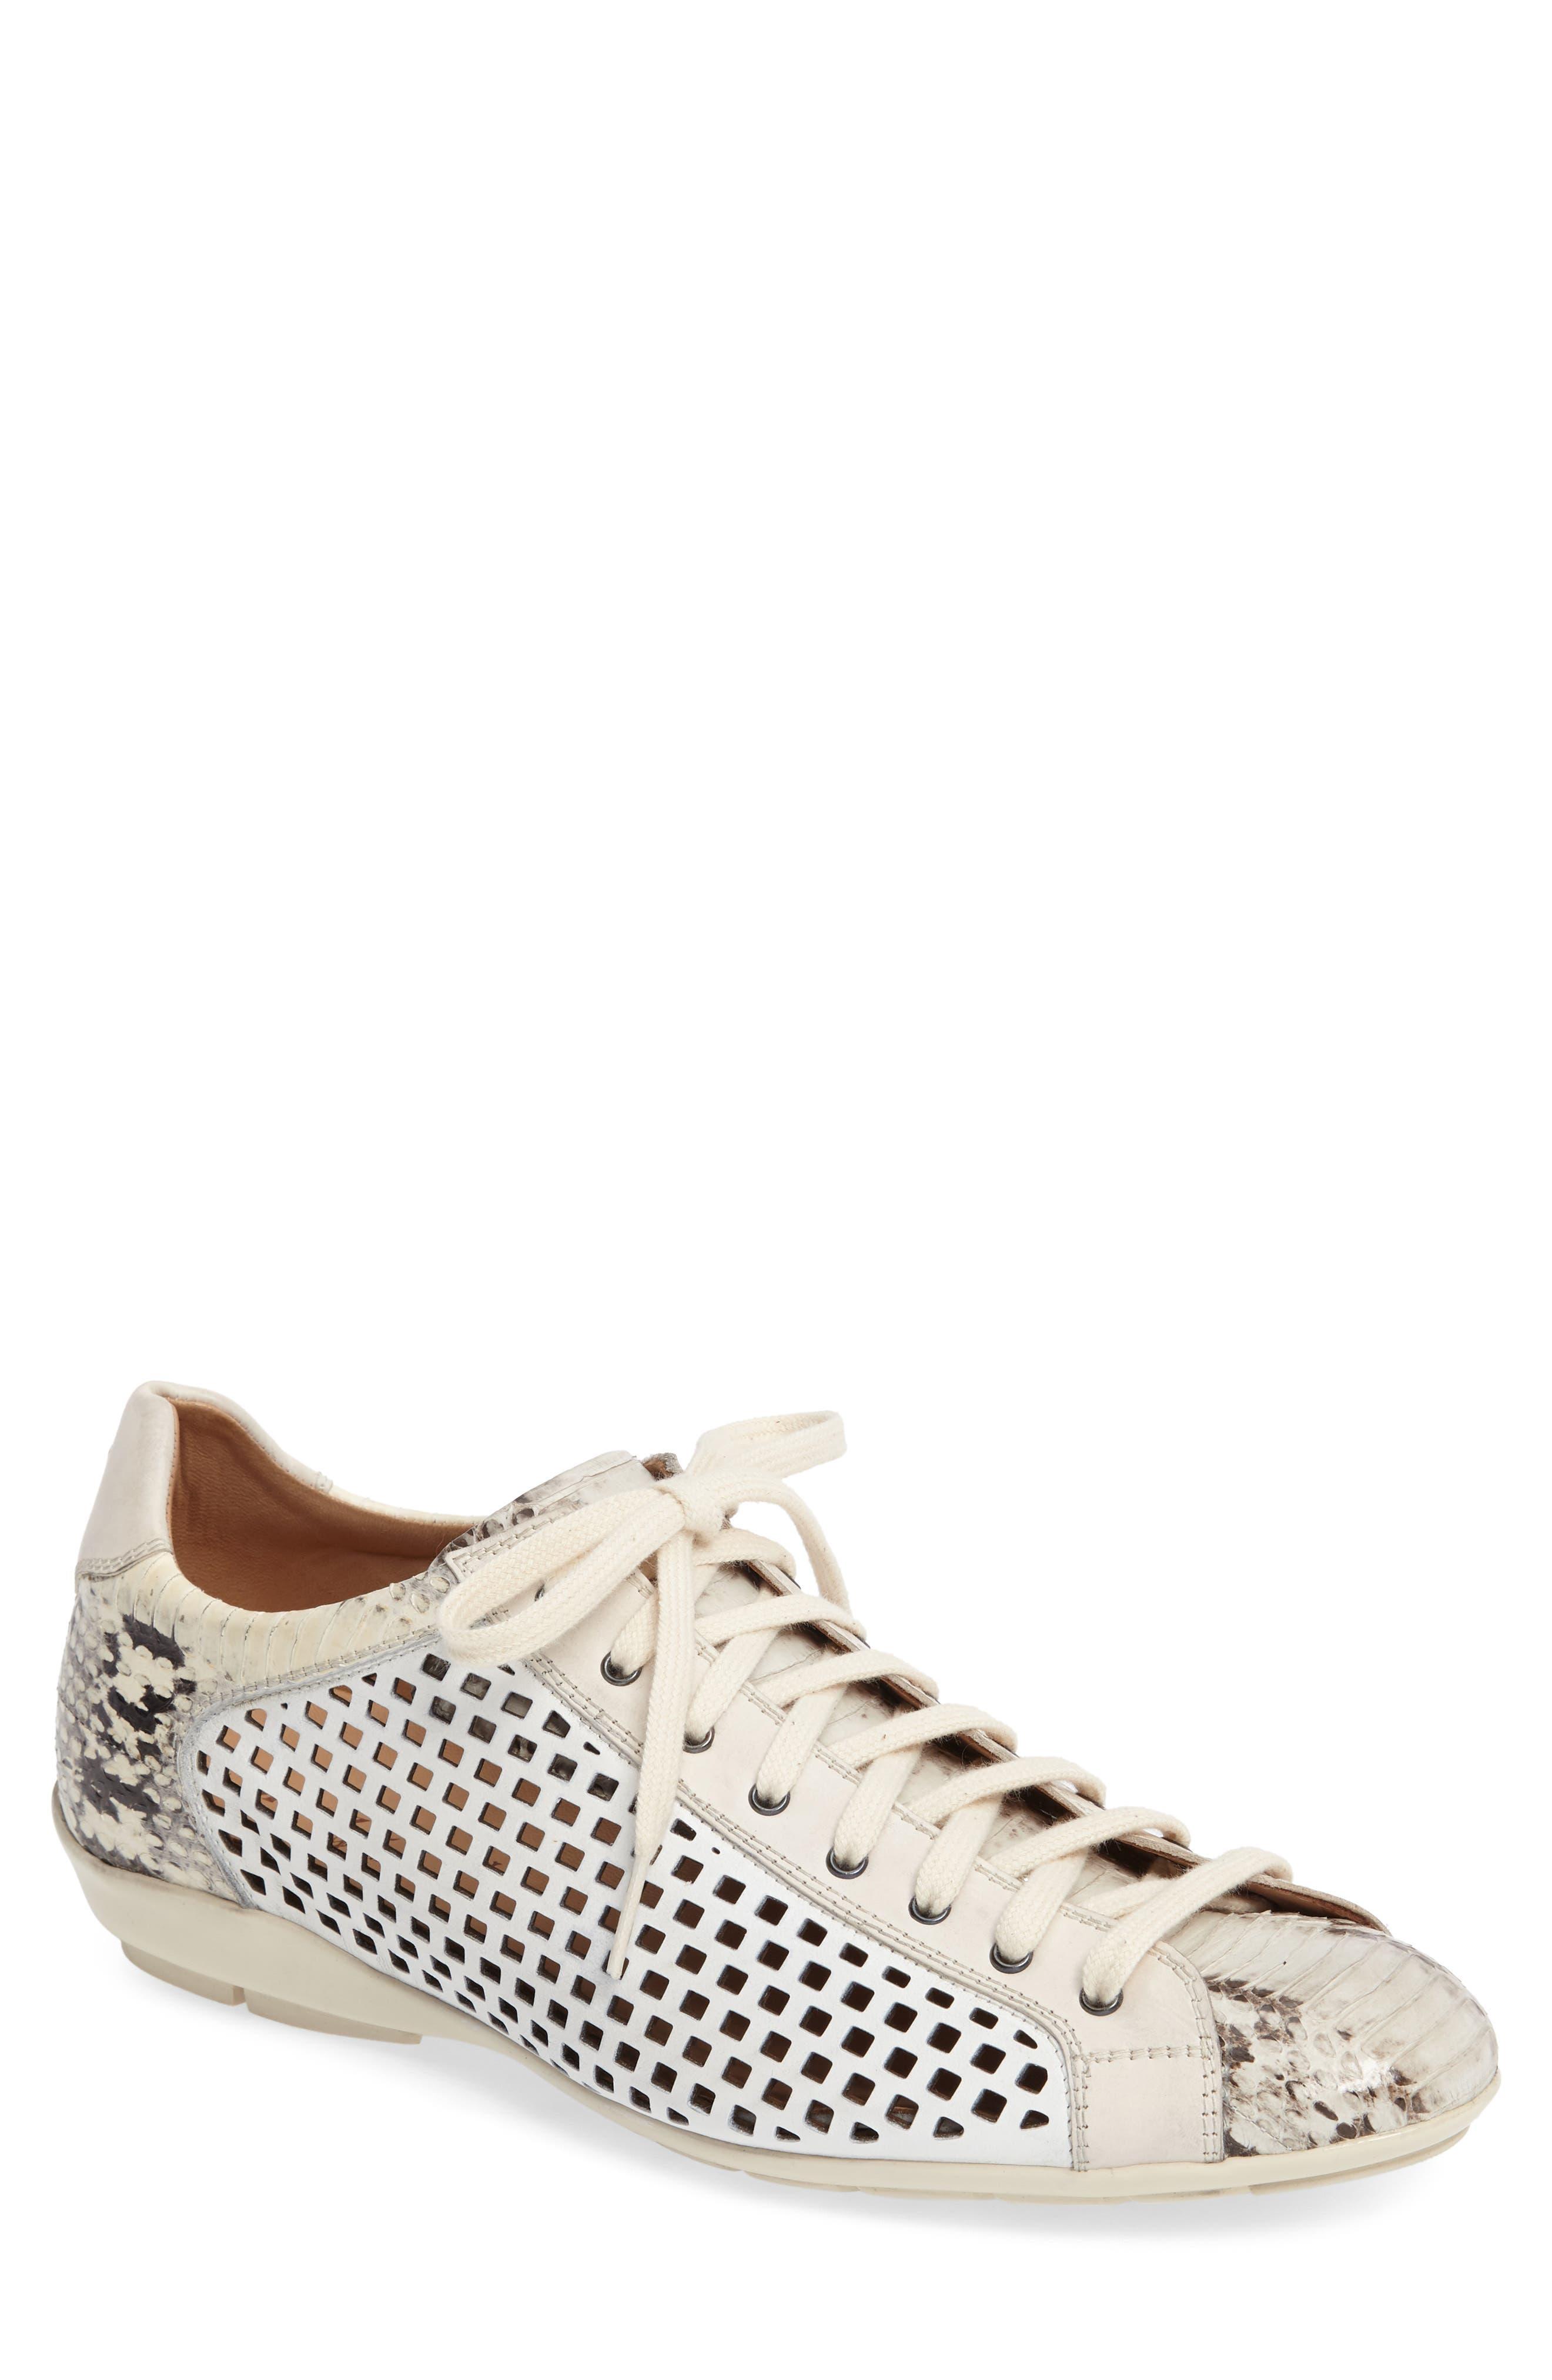 Scharf Sneaker,                         Main,                         color, Bone